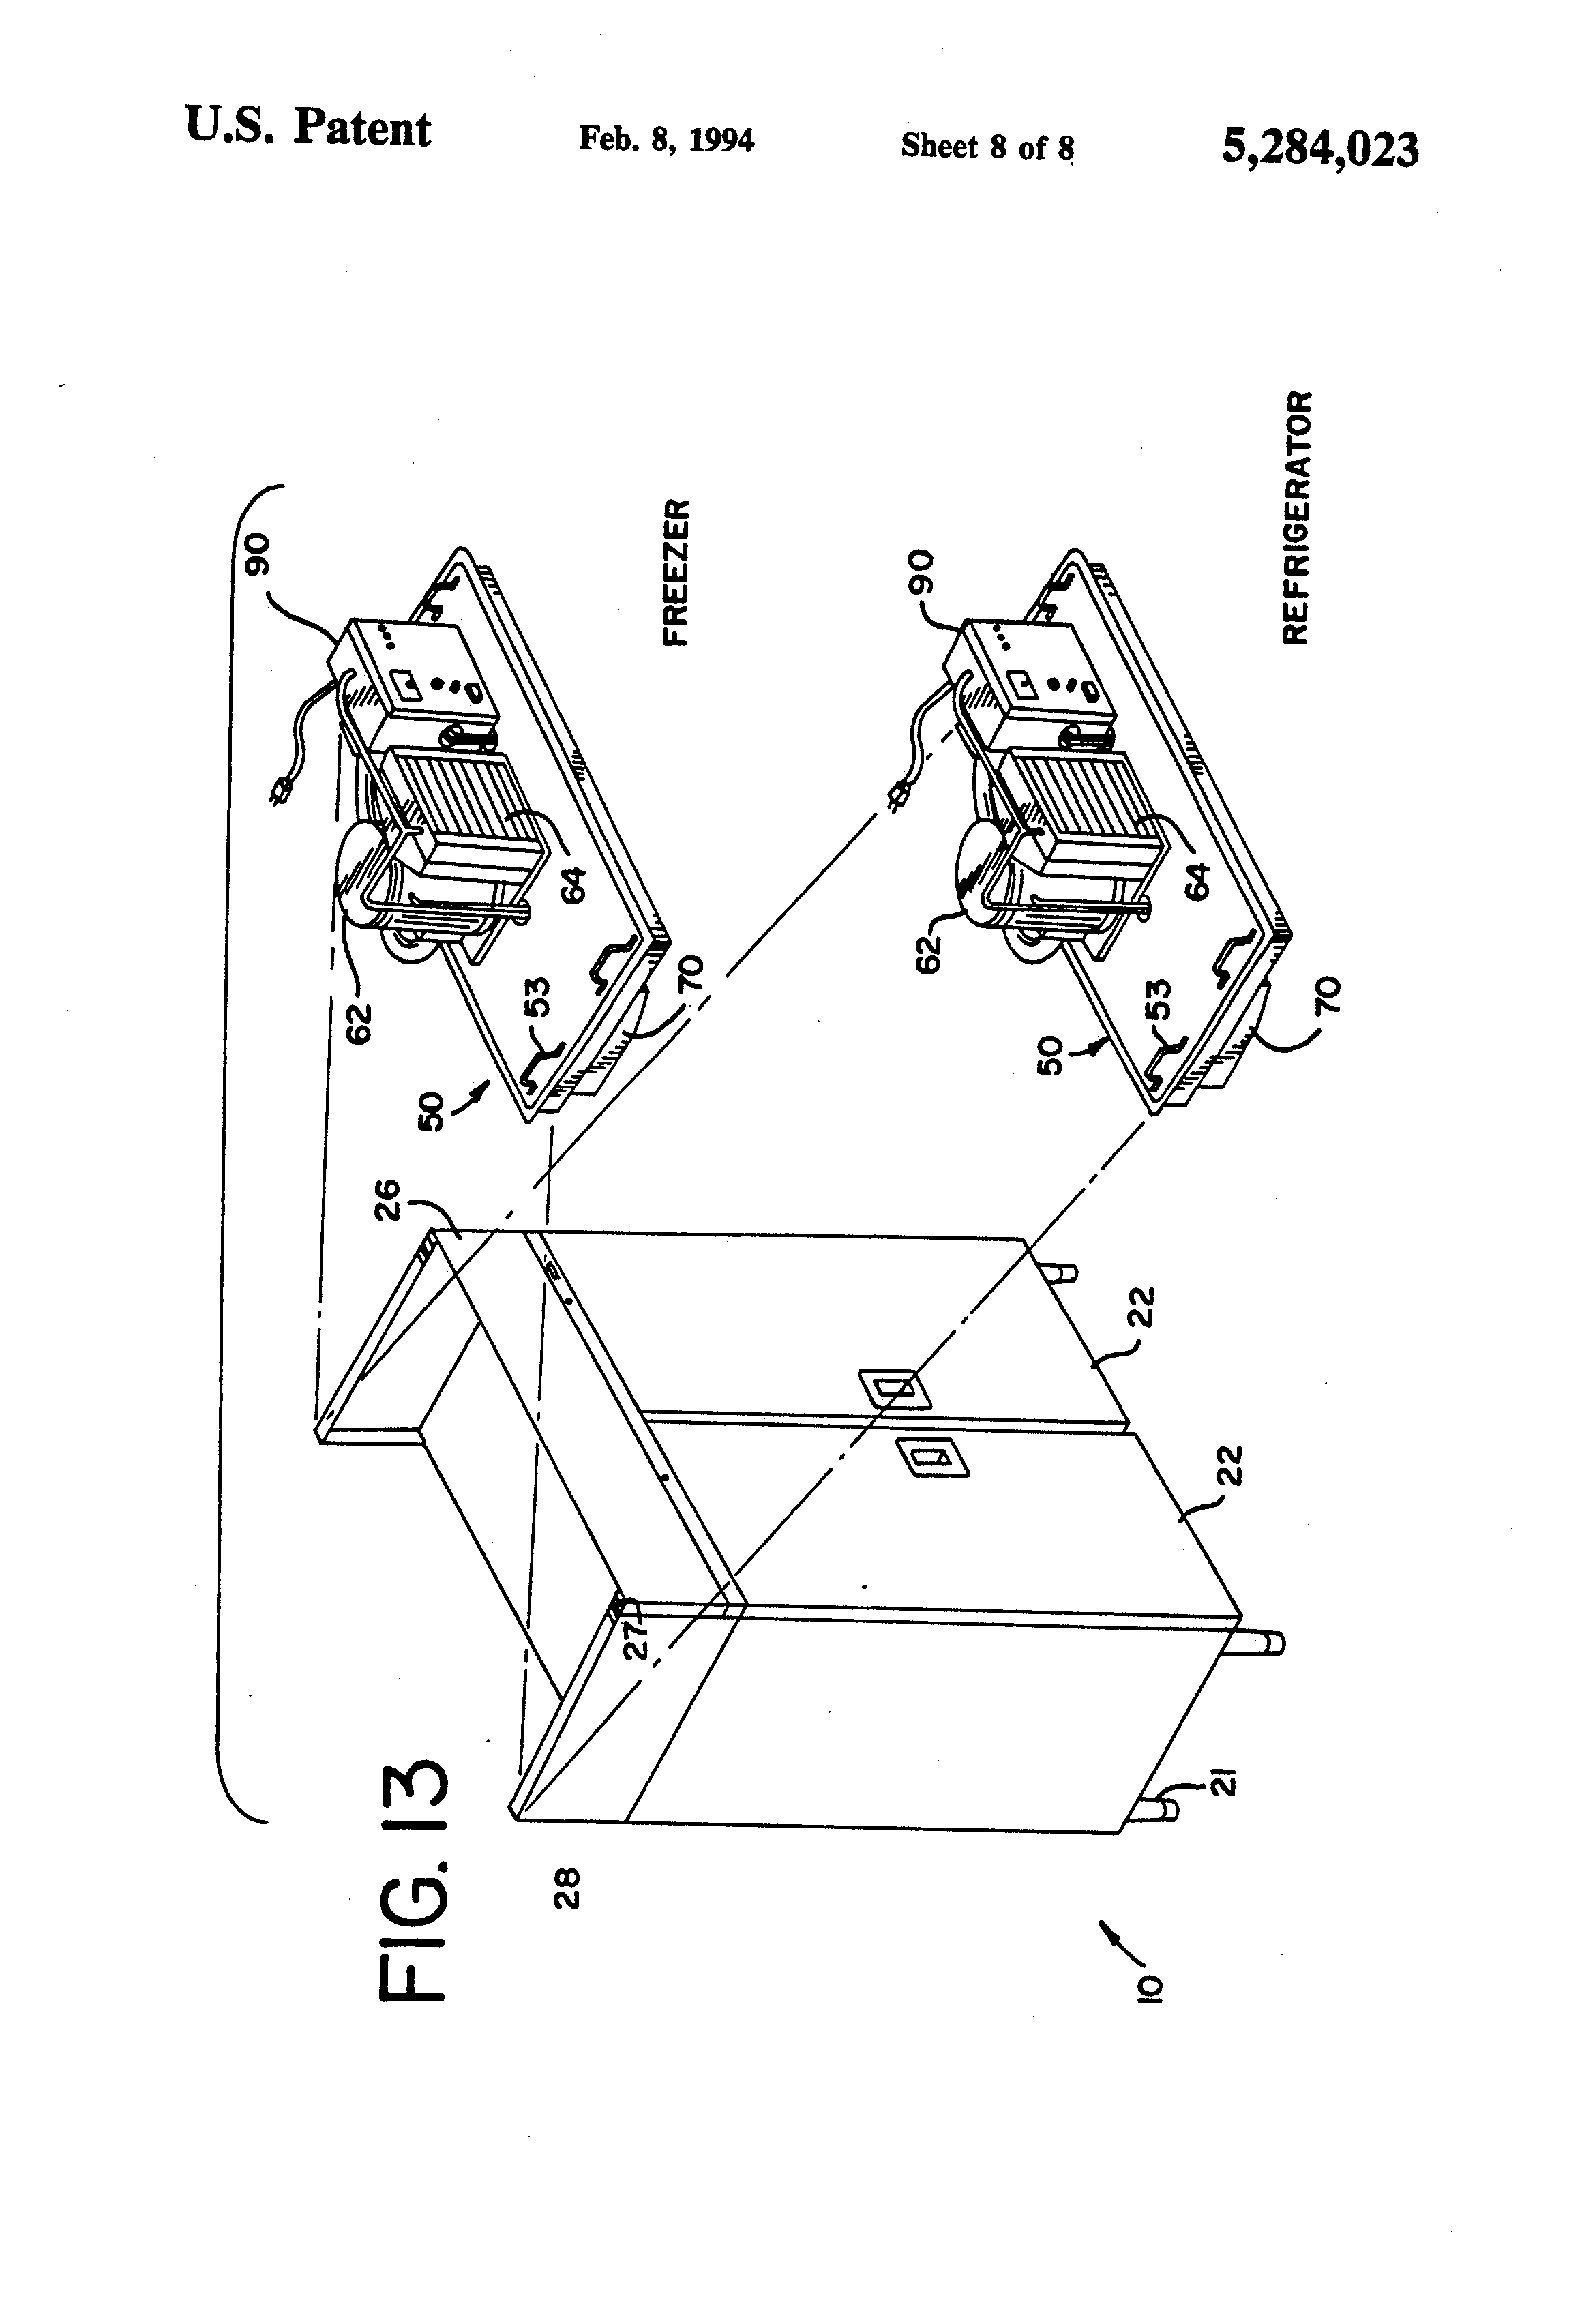 wiring diagrams for traulsen freezers diagrams free printable wiring diagrams